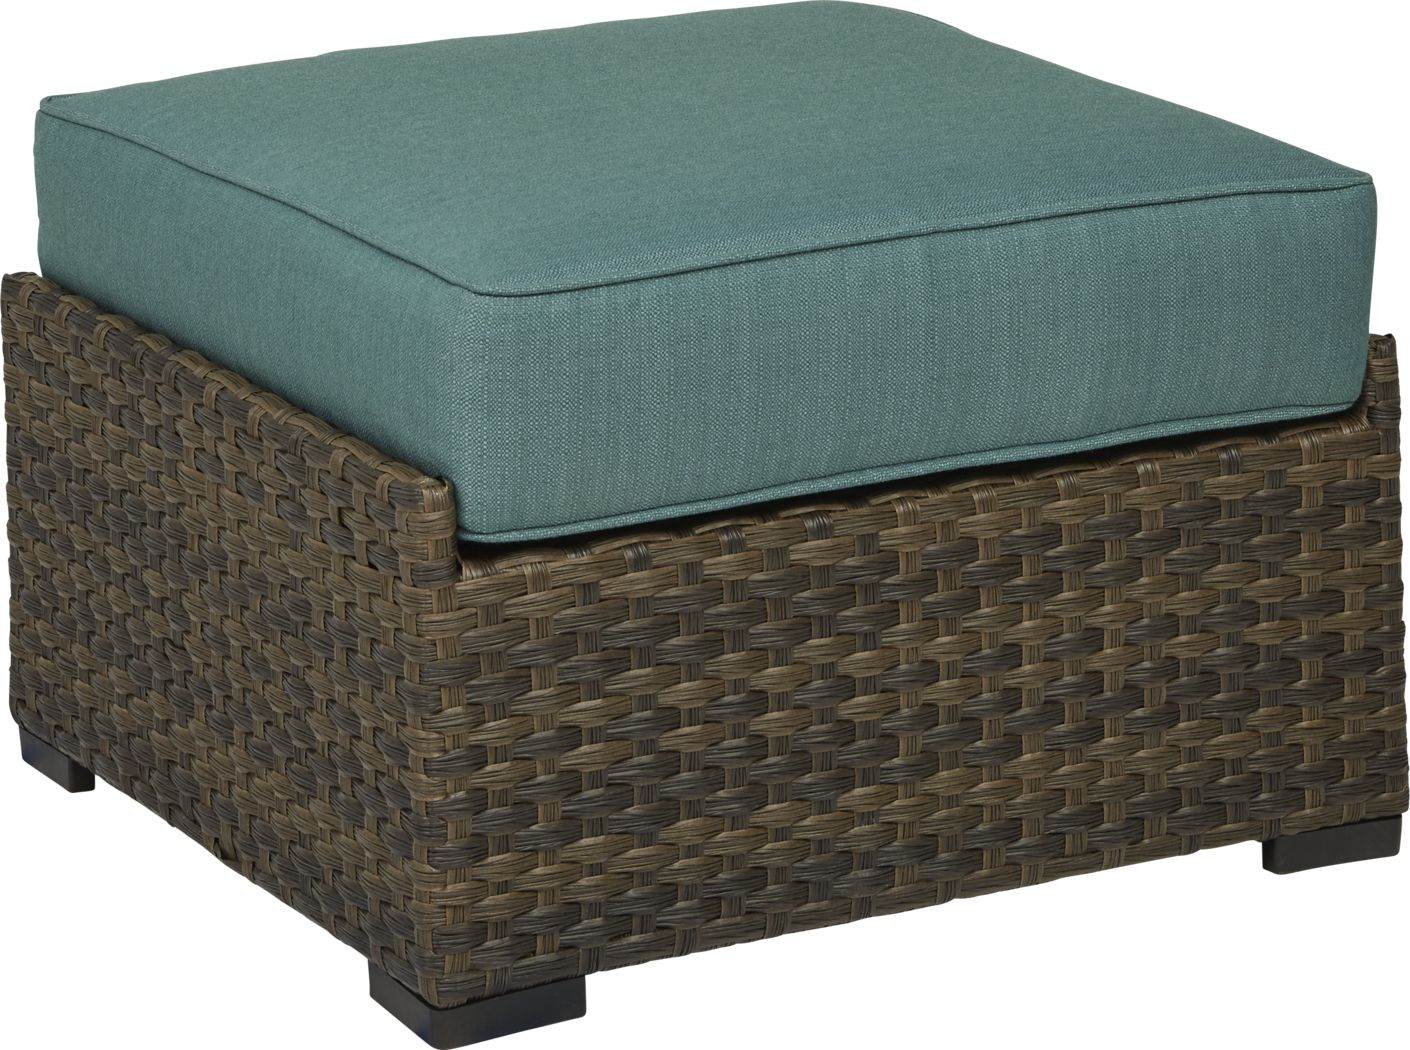 Rialto Brown Outdoor Ottoman with Aqua Cushion